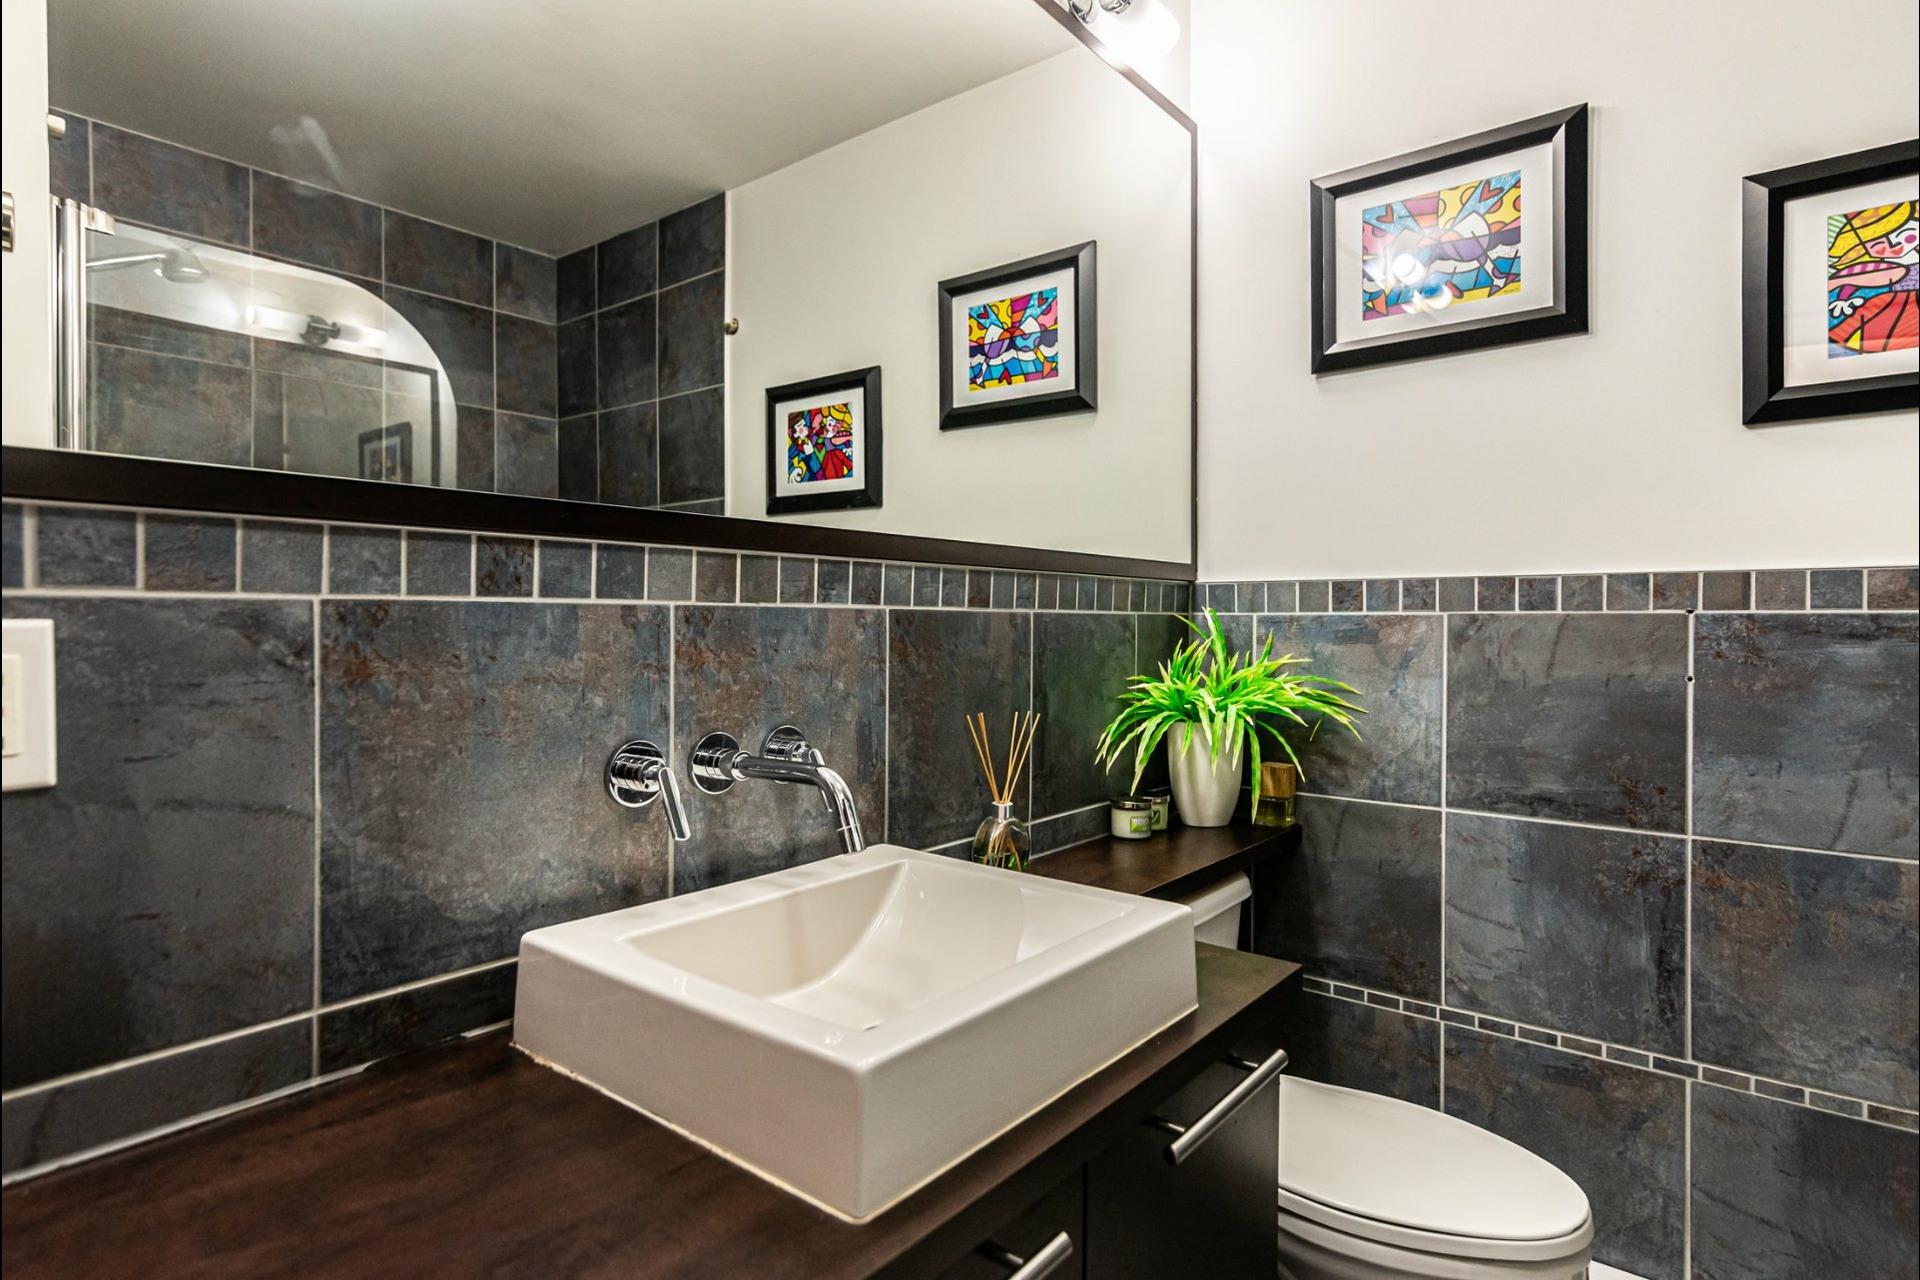 image 10 - Departamento En venta Saint-Laurent Montréal  - 4 habitaciones